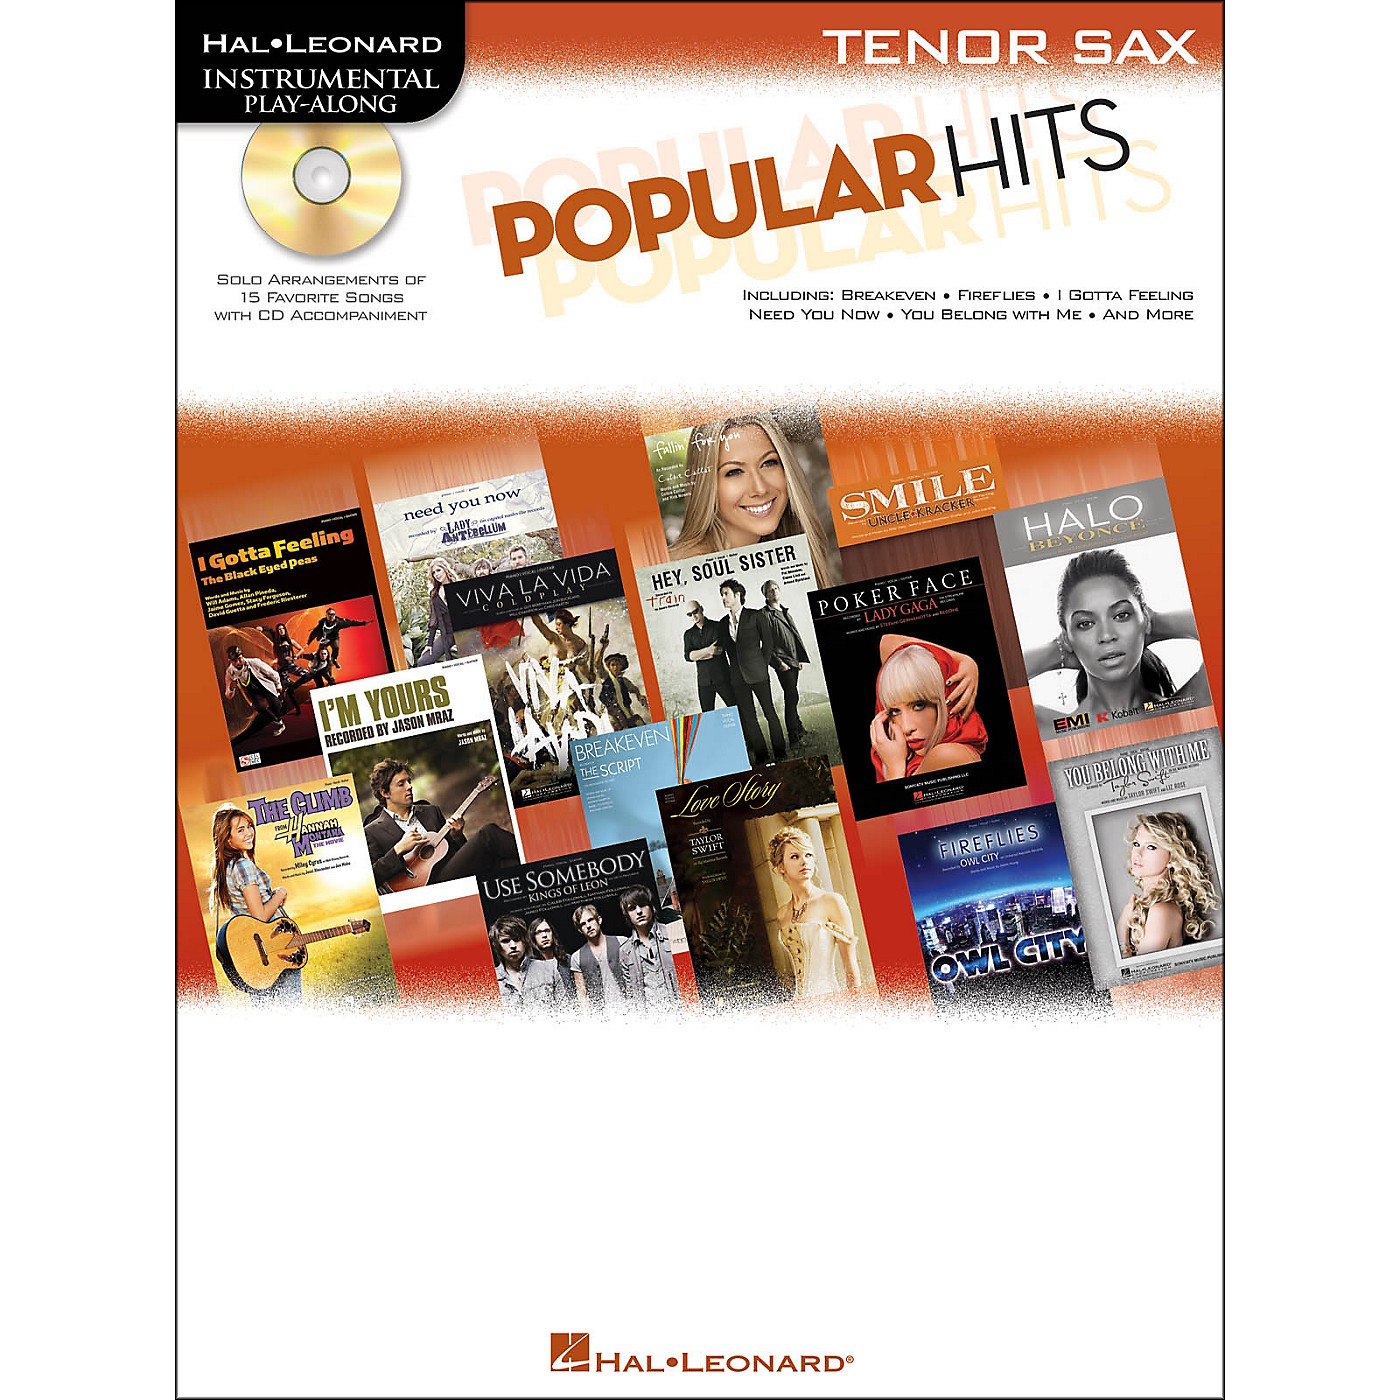 Hal Leonard Popular Hits For Tenor Sax - Instrumental Play-Along Book/CD thumbnail